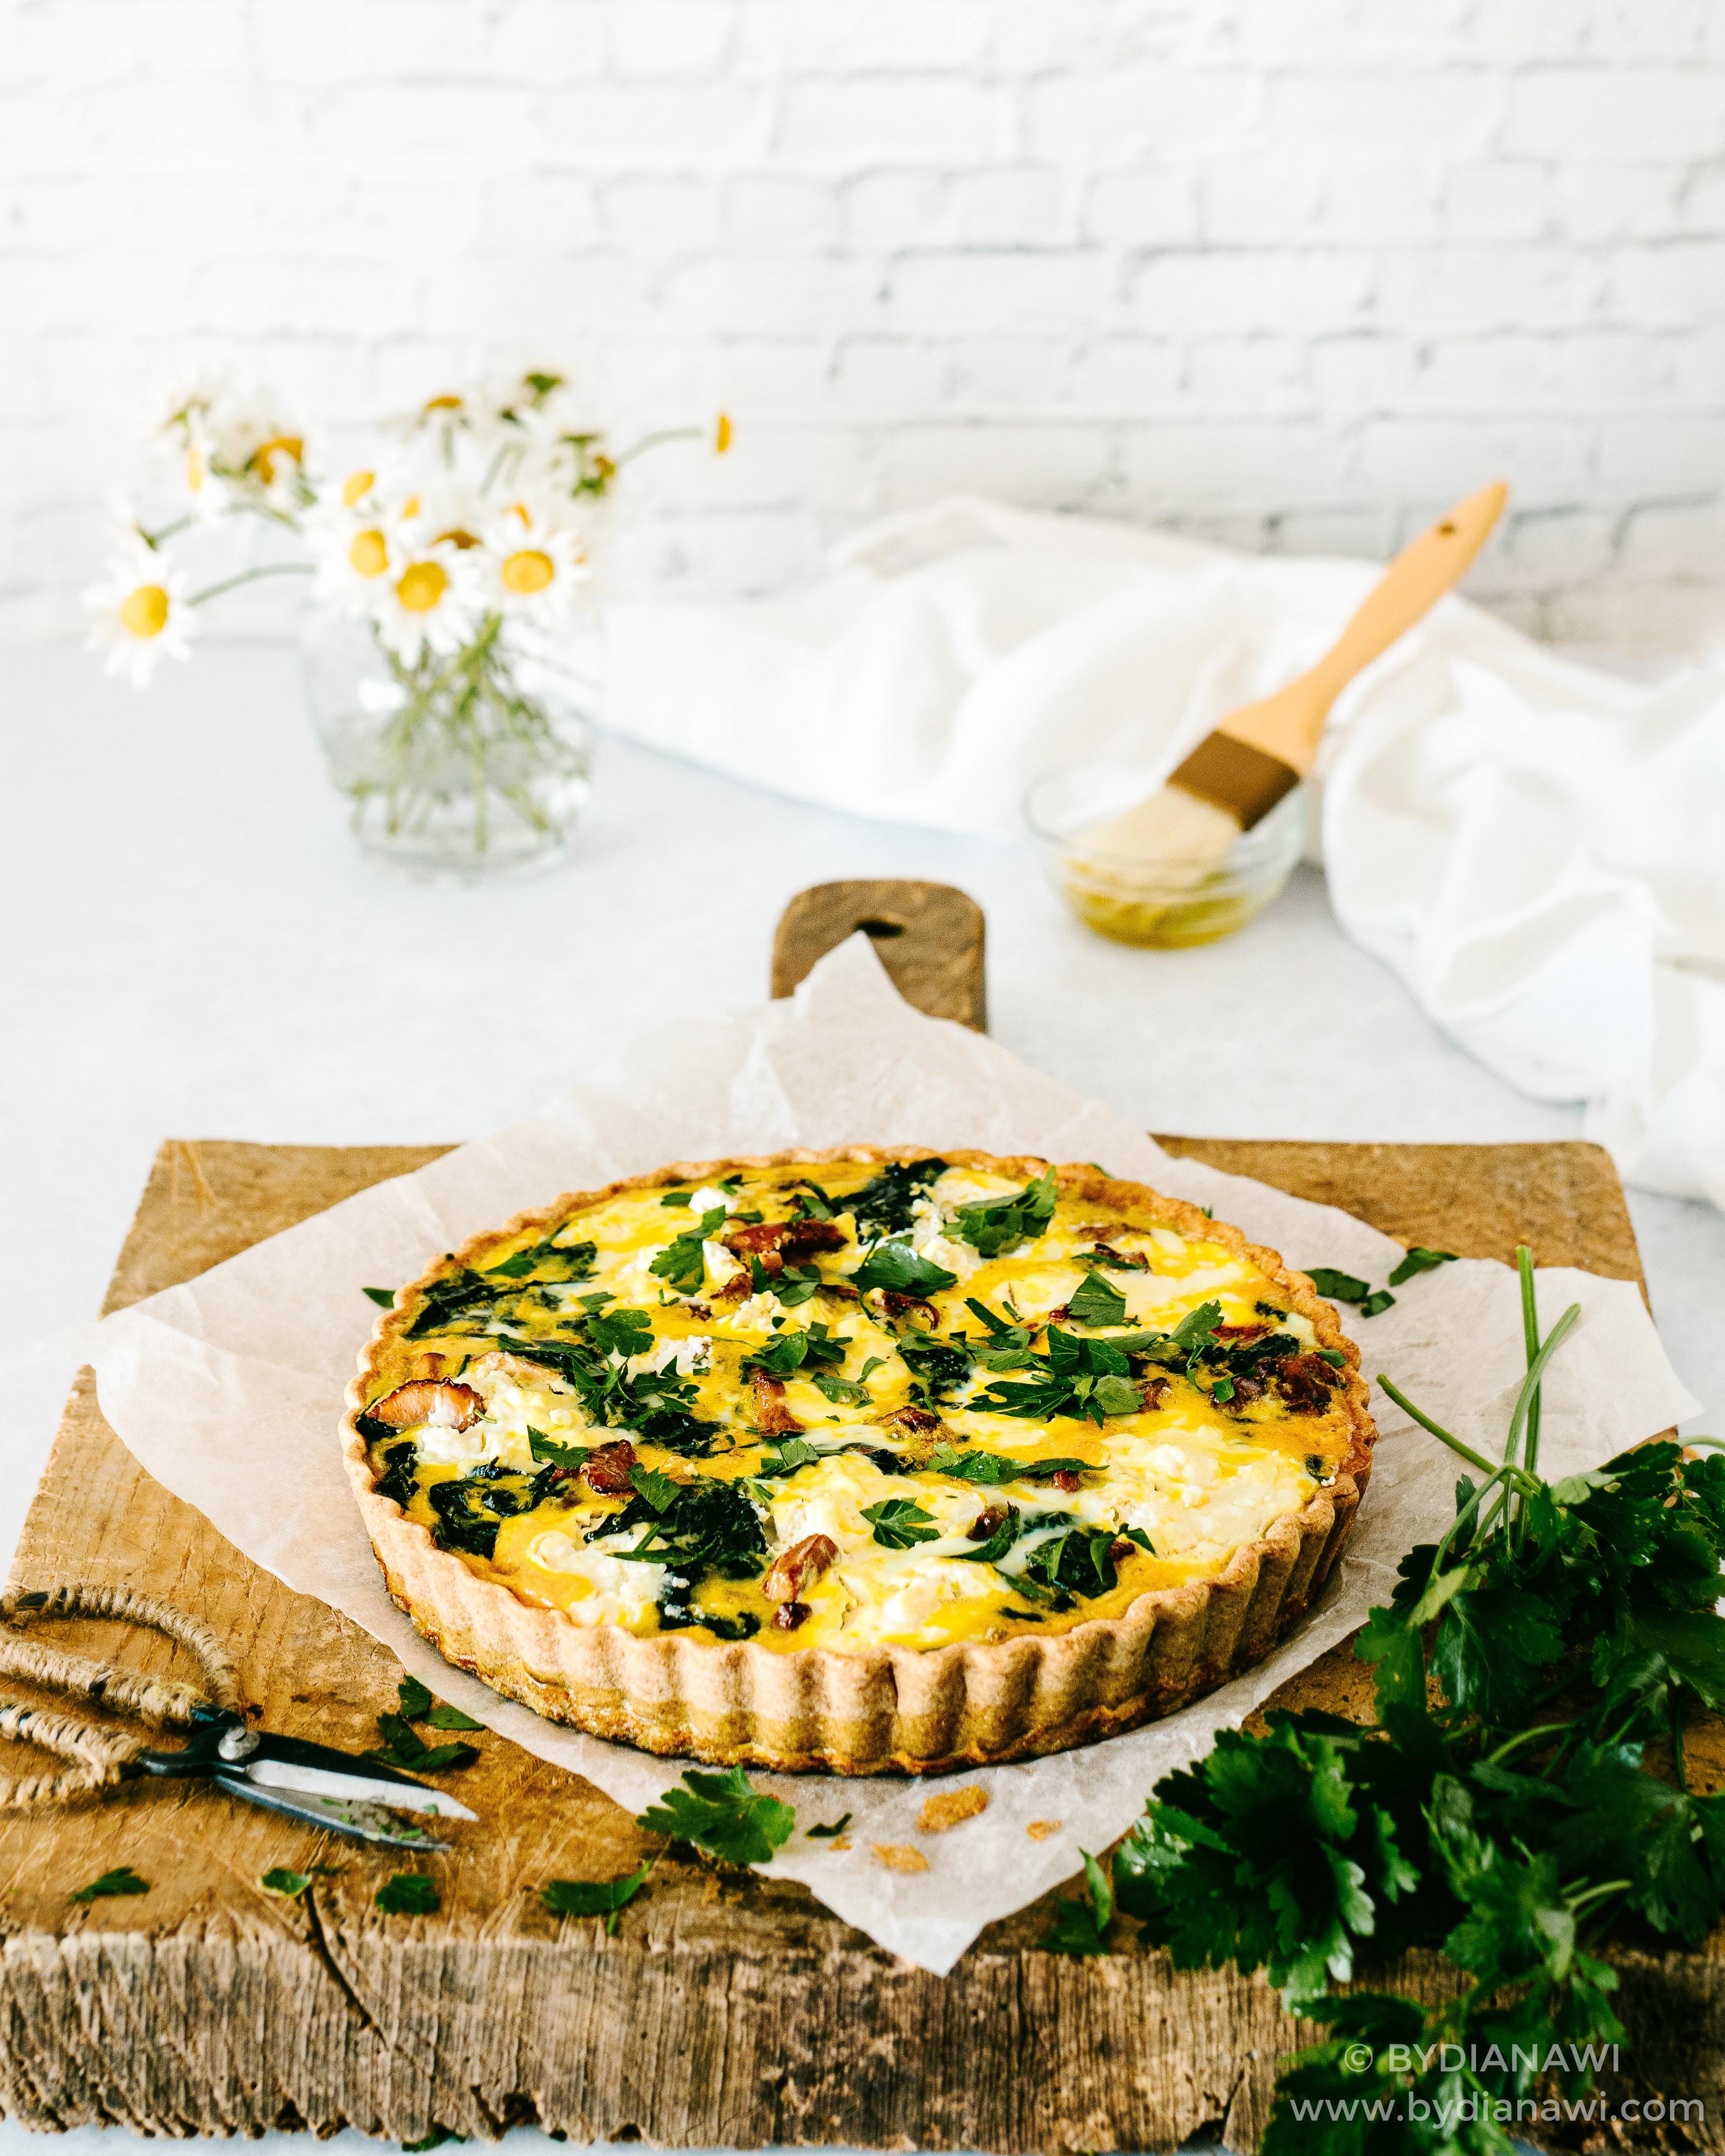 tærte med kantareller, spinat, ricotta ost, opskrift, madtærte